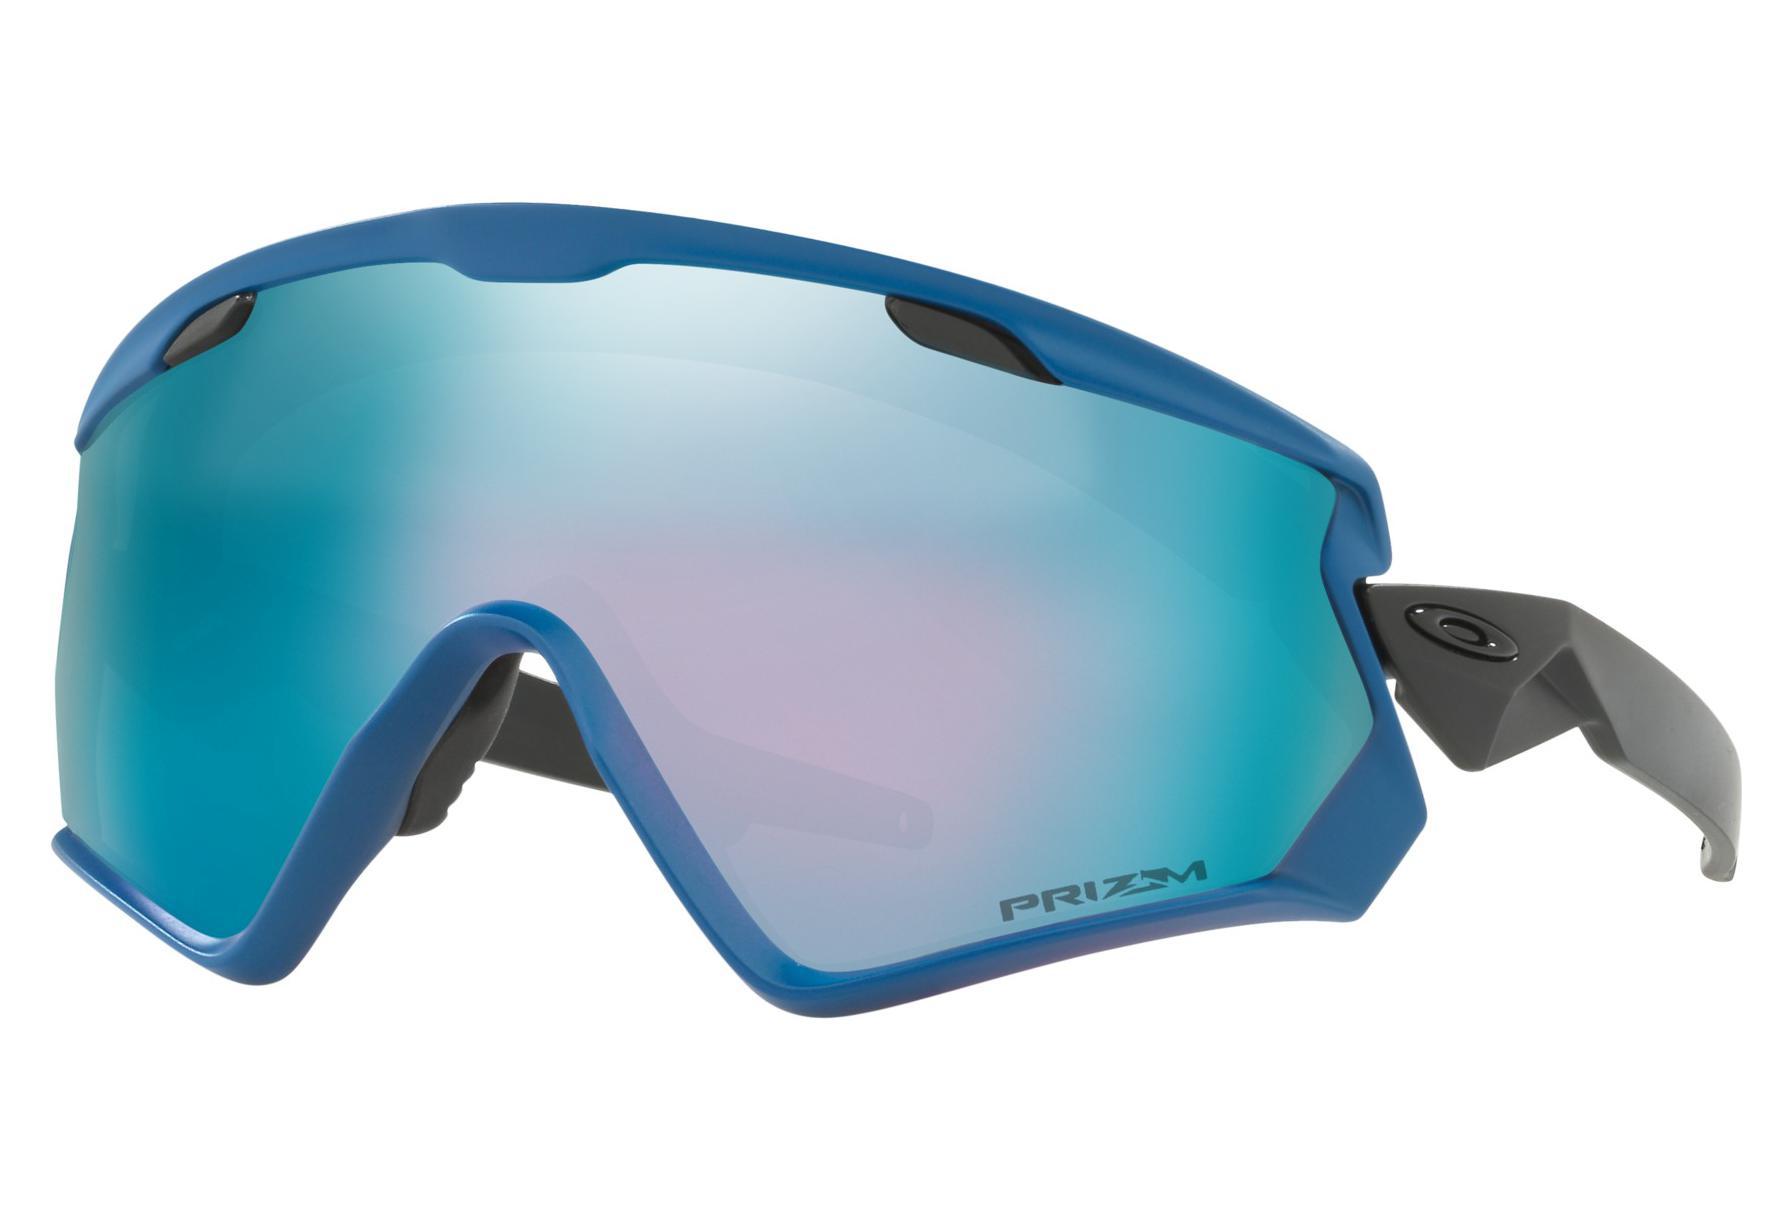 f3b4a86ce44a1e Lunettes Oakley Wind Jacket 2 Bleu Californie Prizm Snow Sapphire Iridium    ref. OO7072-